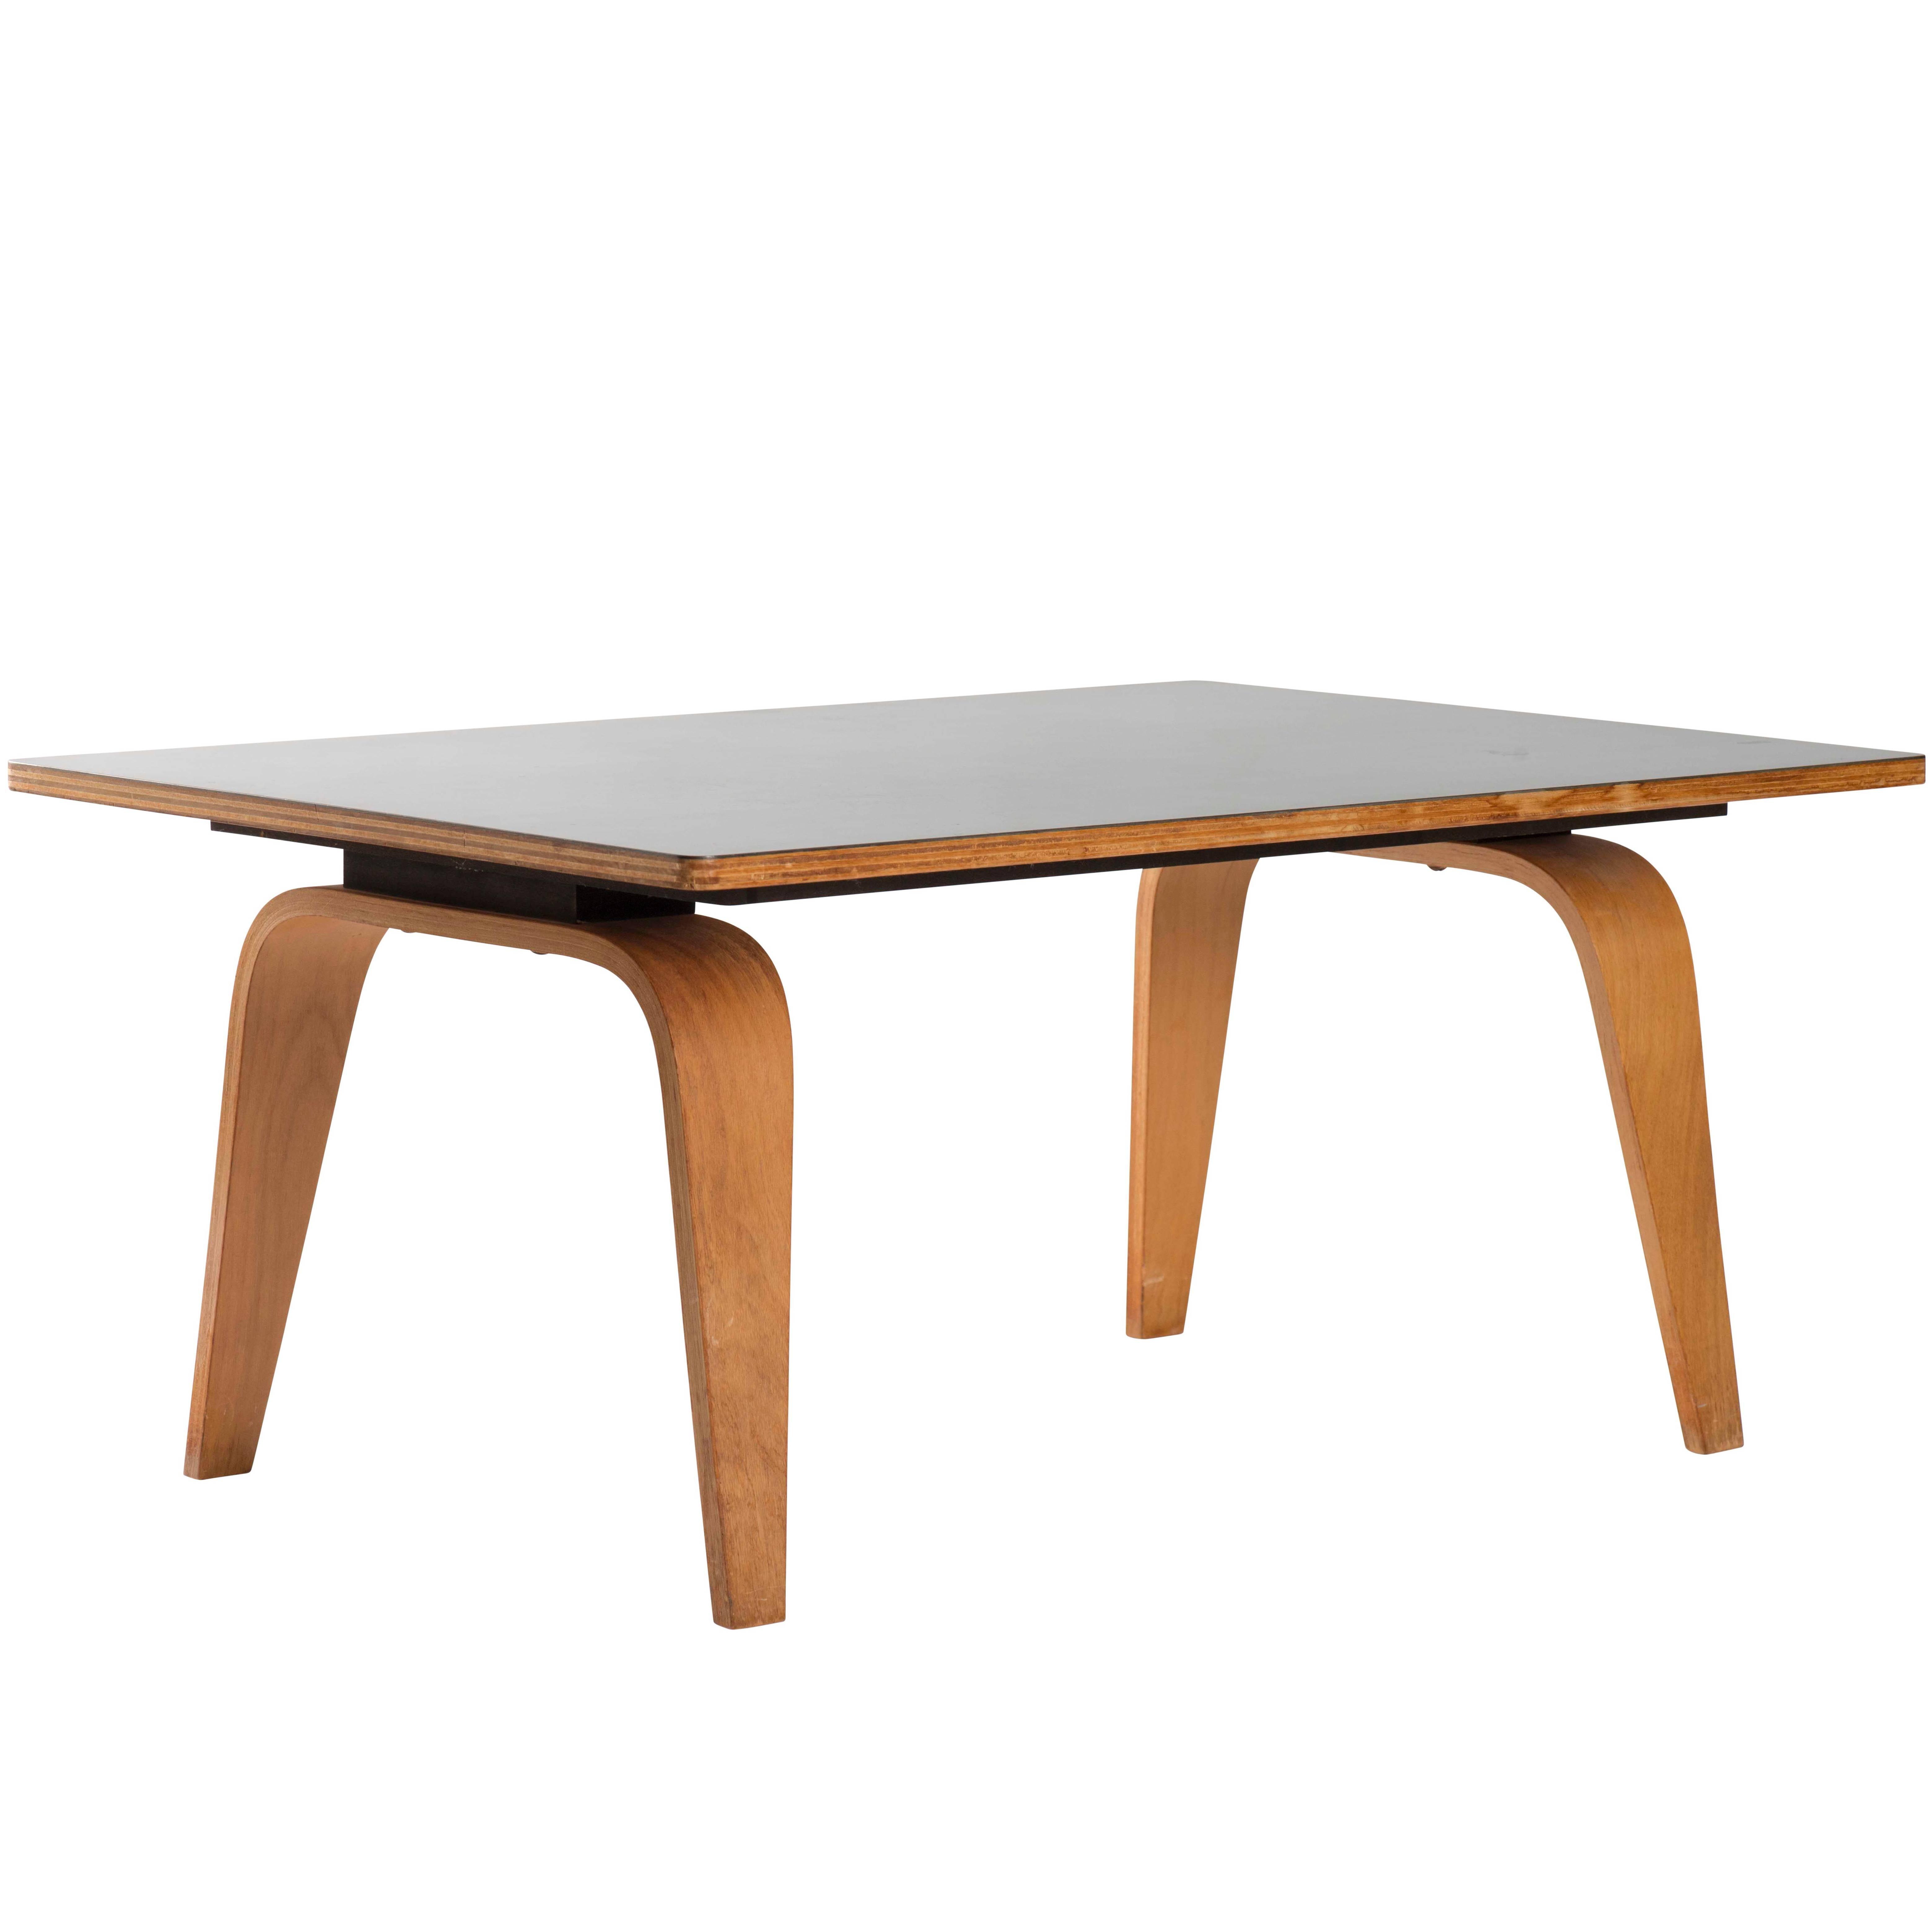 1940s herman miller otwctw1 coffee table by charles eames